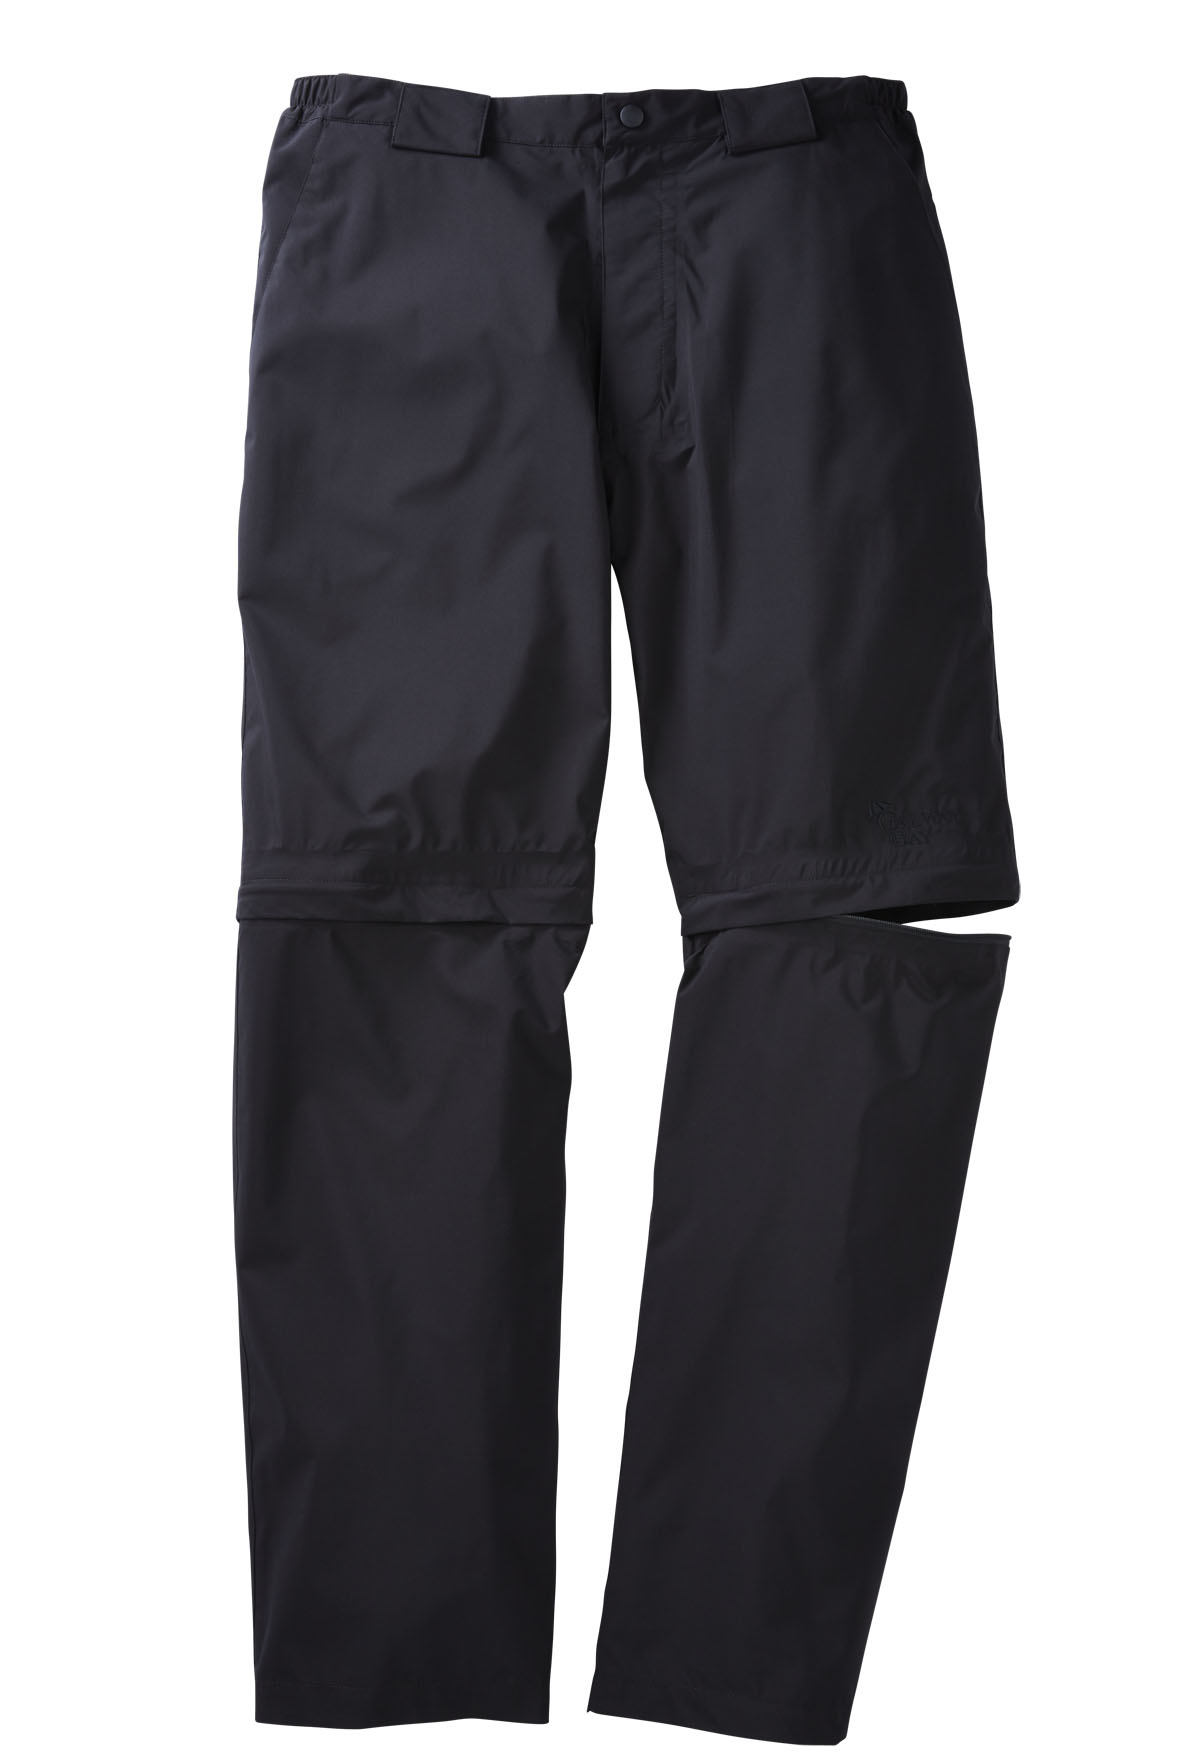 Galway Bay Golf- Lightweight Zip Off Rain Pants